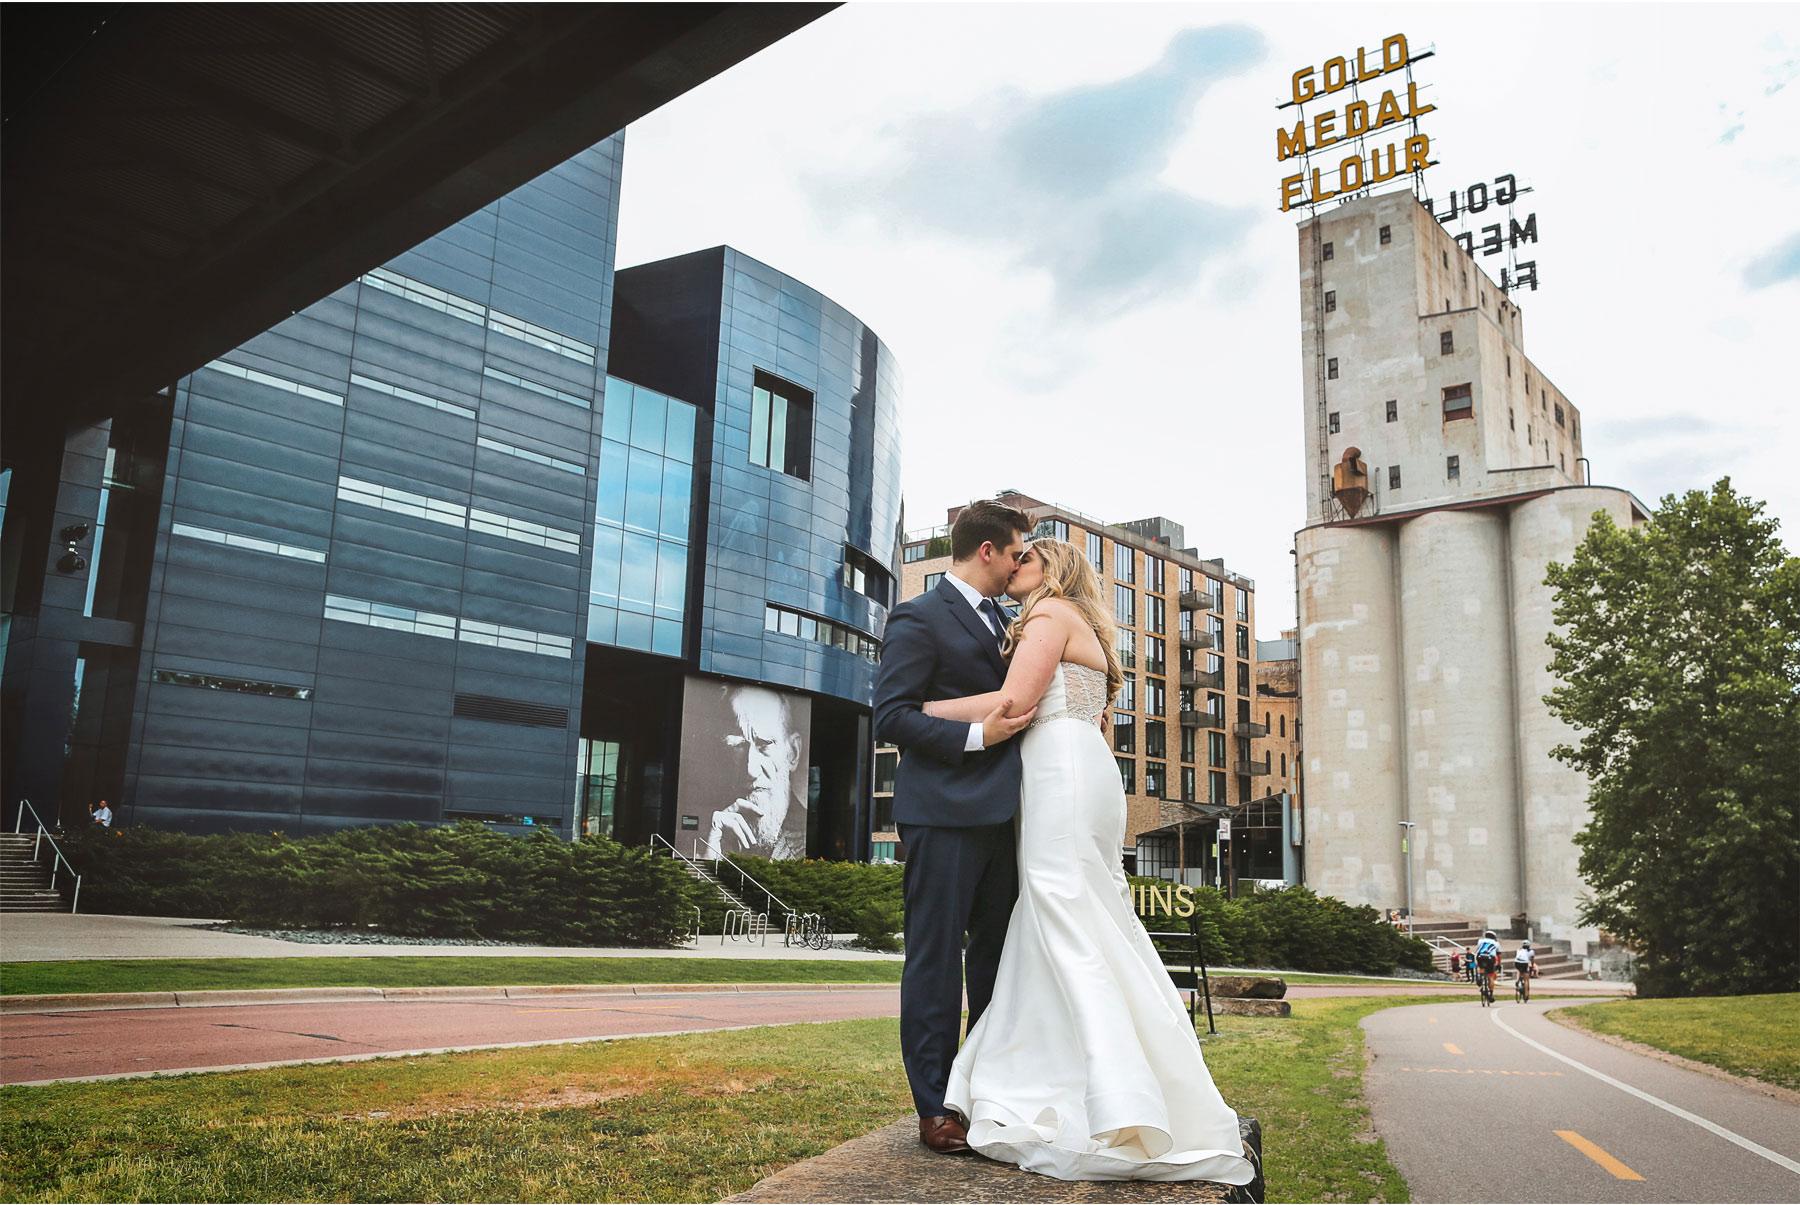 14-Minneapolis-Minnesota-Wedding-Vick-Photography-The-Depot-Bride-Groom-Gold-Metal-Park-Guthrie-Amelia-and-Alexander.jpg